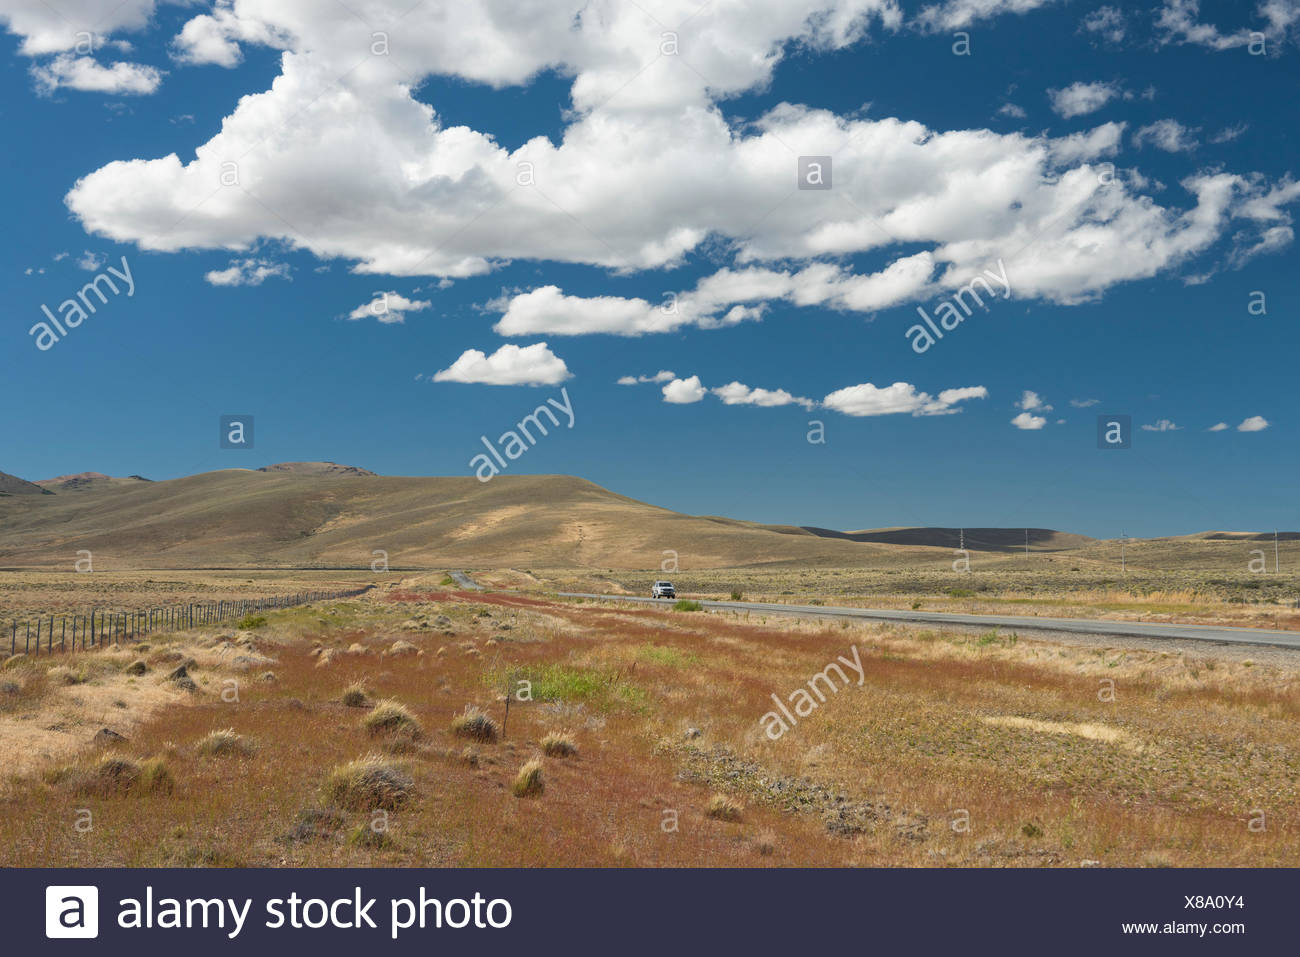 América del Sur, Argentina, Patagonia, Chubut, autopistas y Ruta 40,highway Imagen De Stock